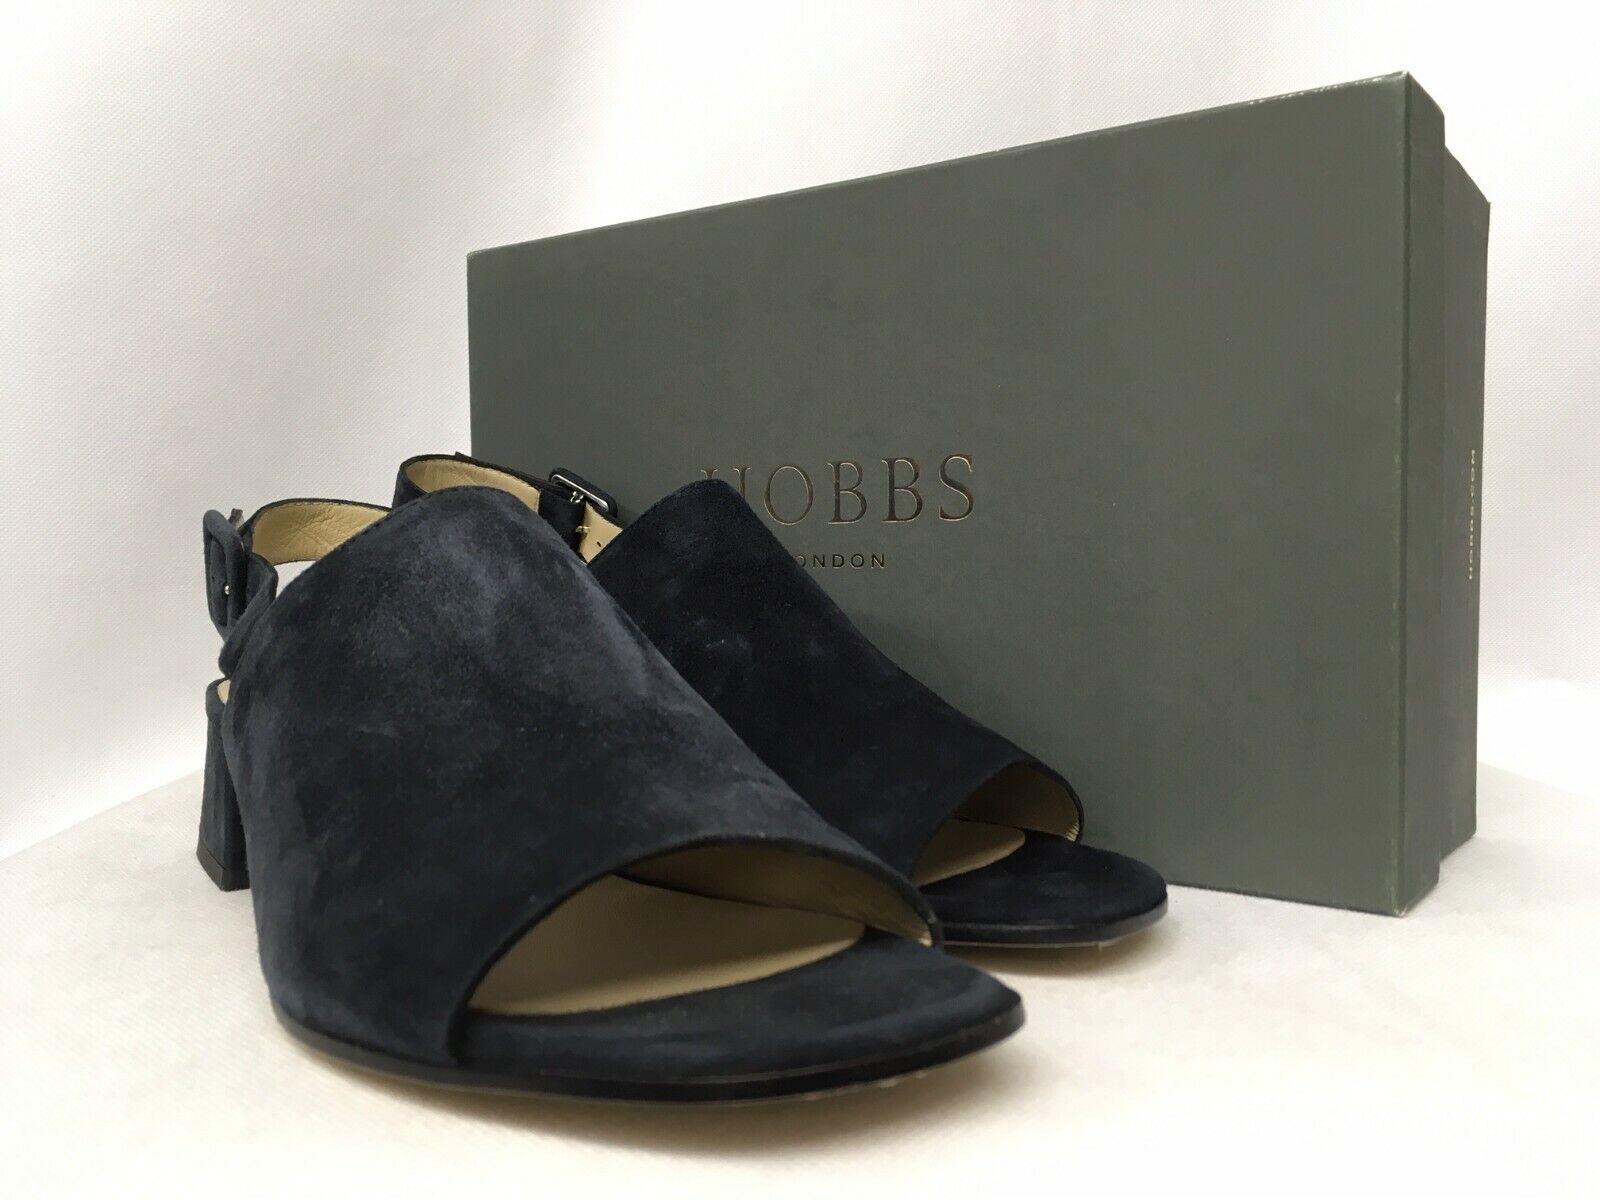 Hobbs Claudine Fine Suede Navy Sandals. Various Größes.